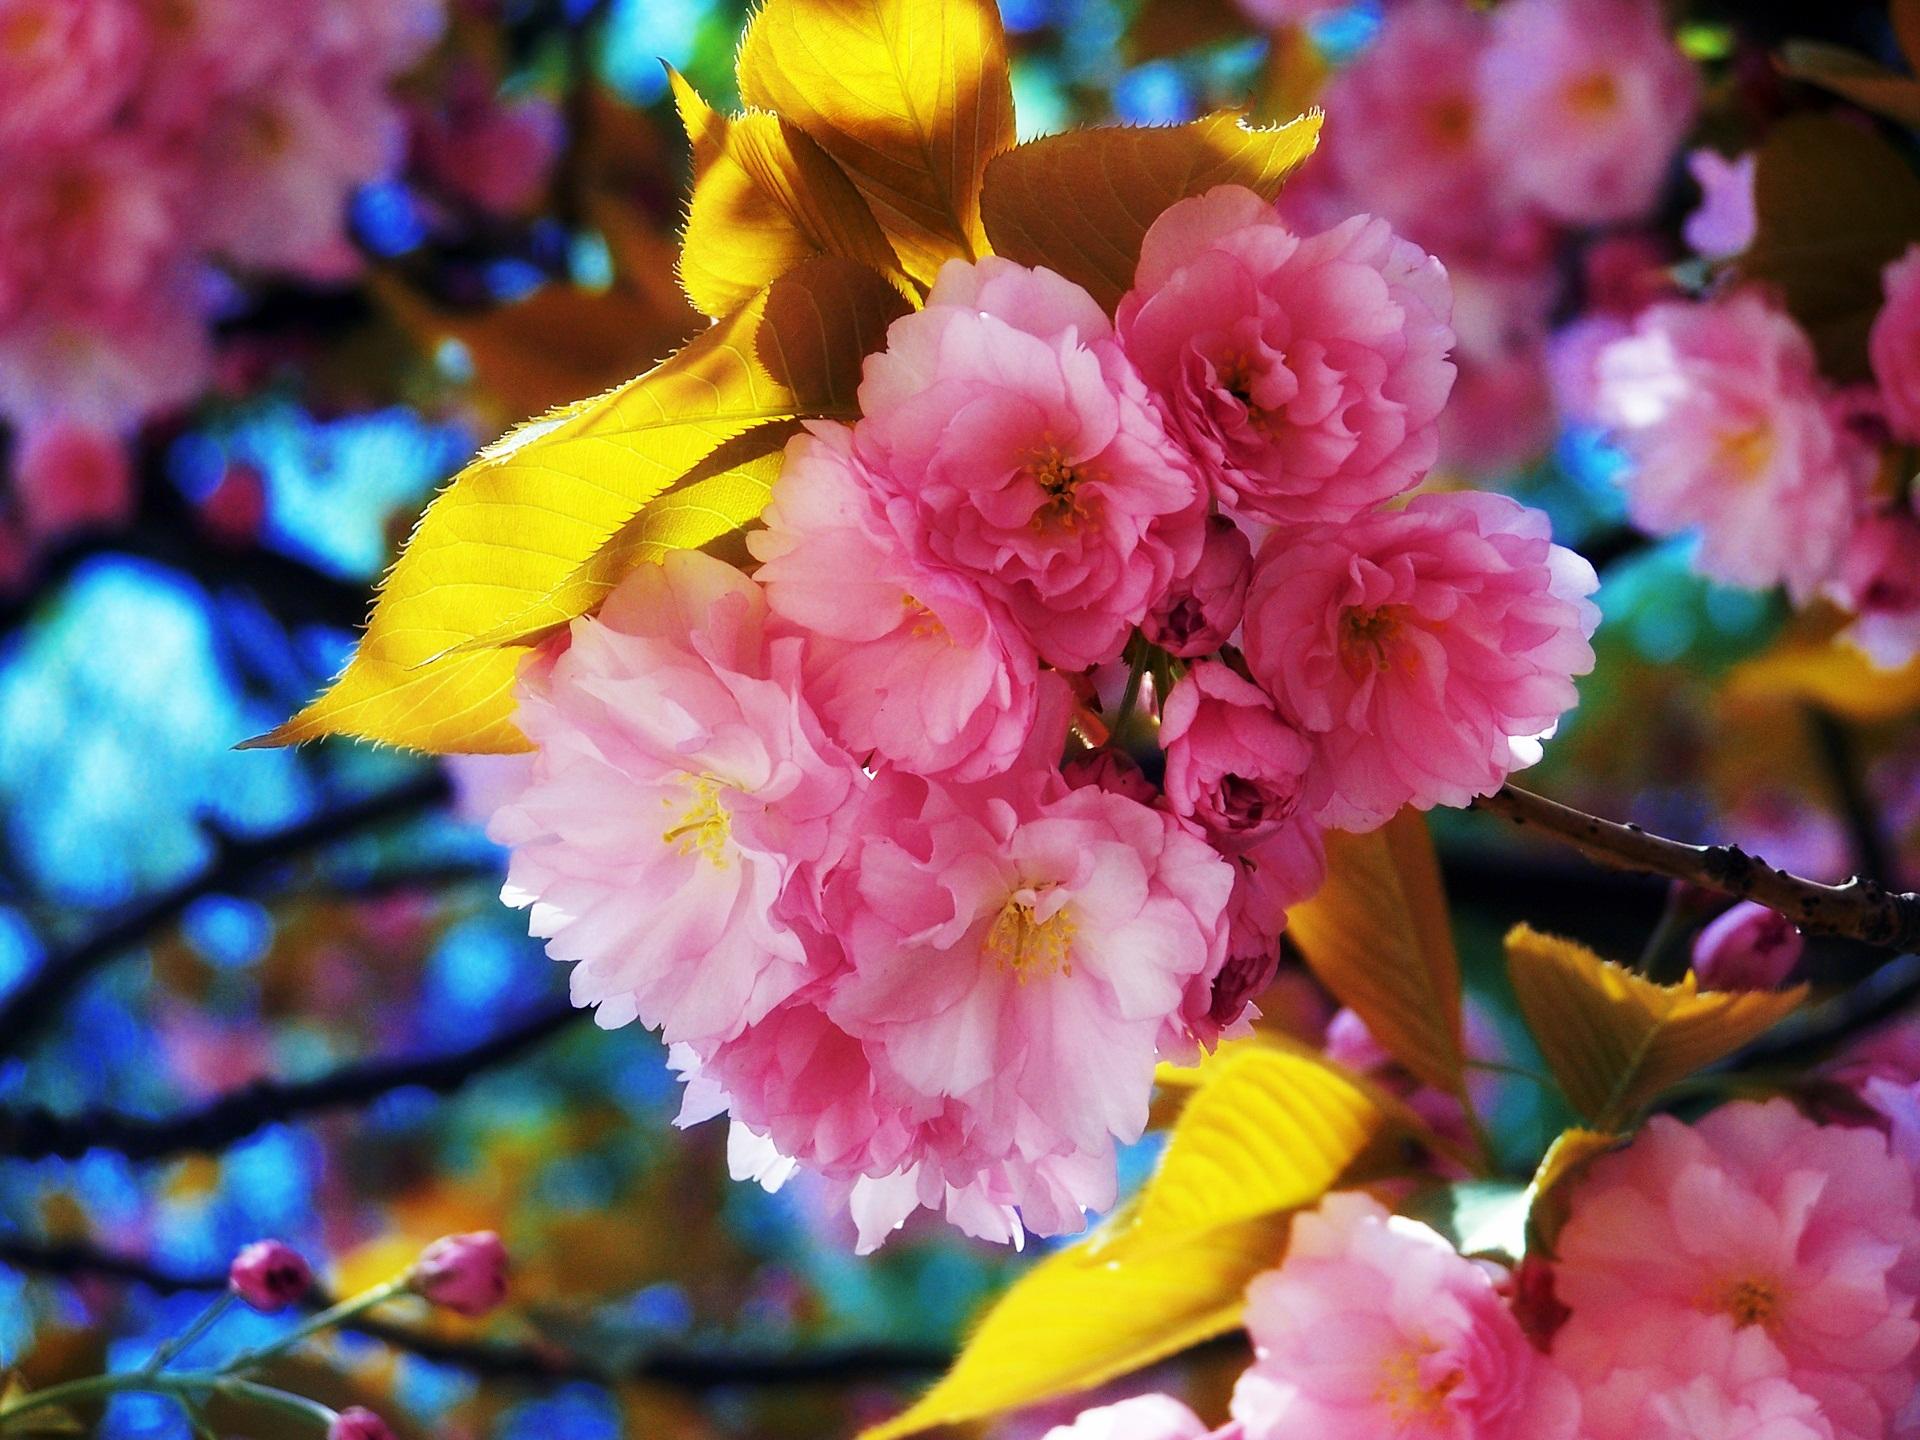 Pretty Flowers Hd Wallpaper 1920x1440 23438